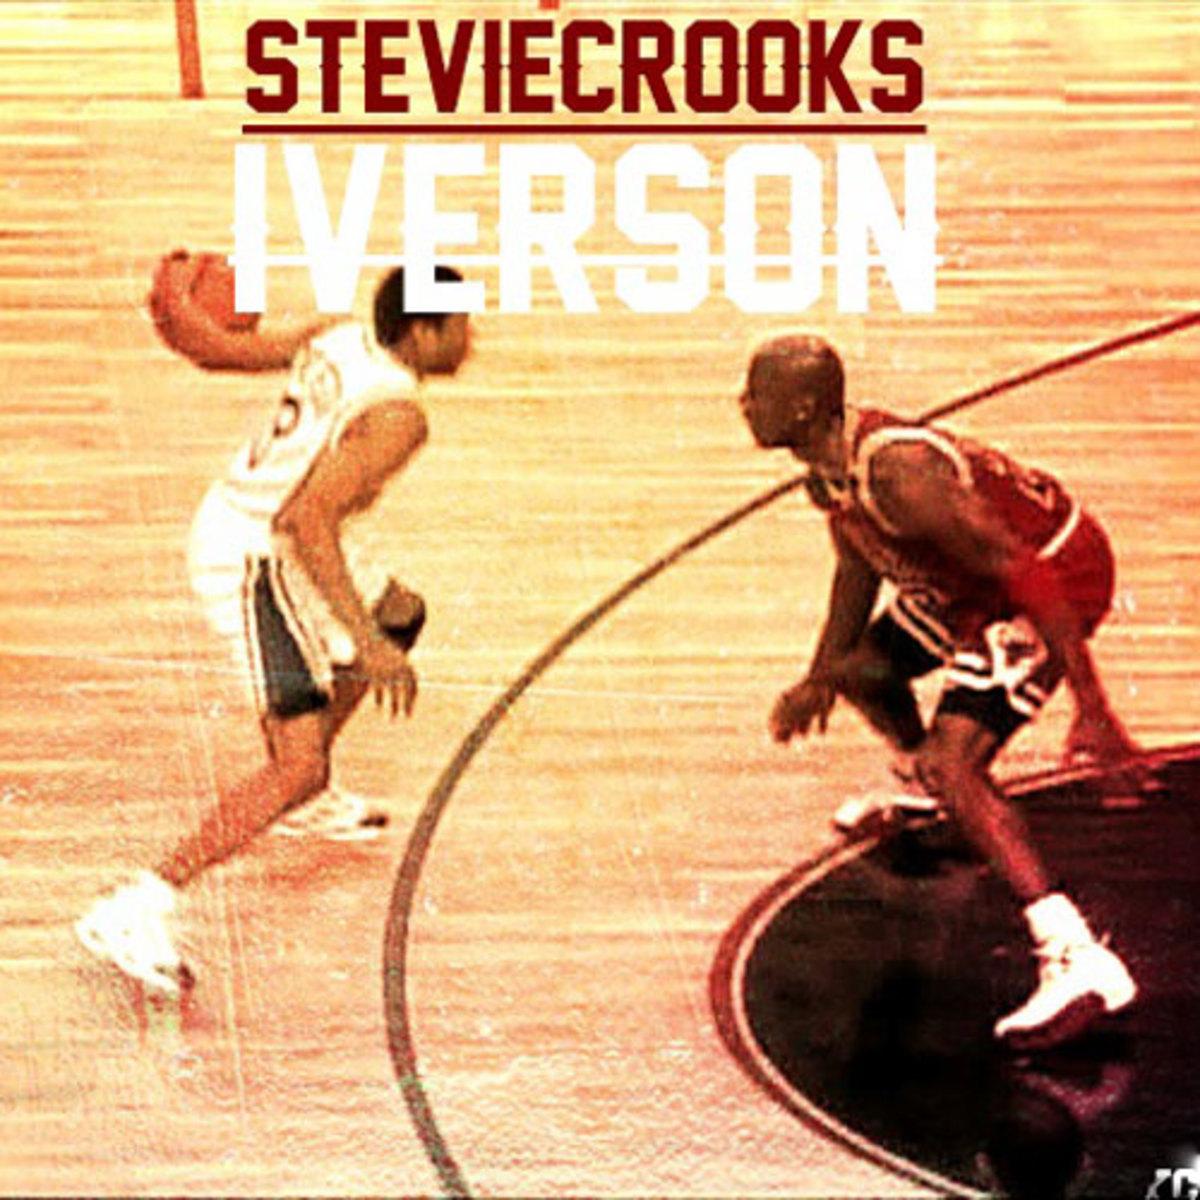 steviecrooks-iverson.jpg